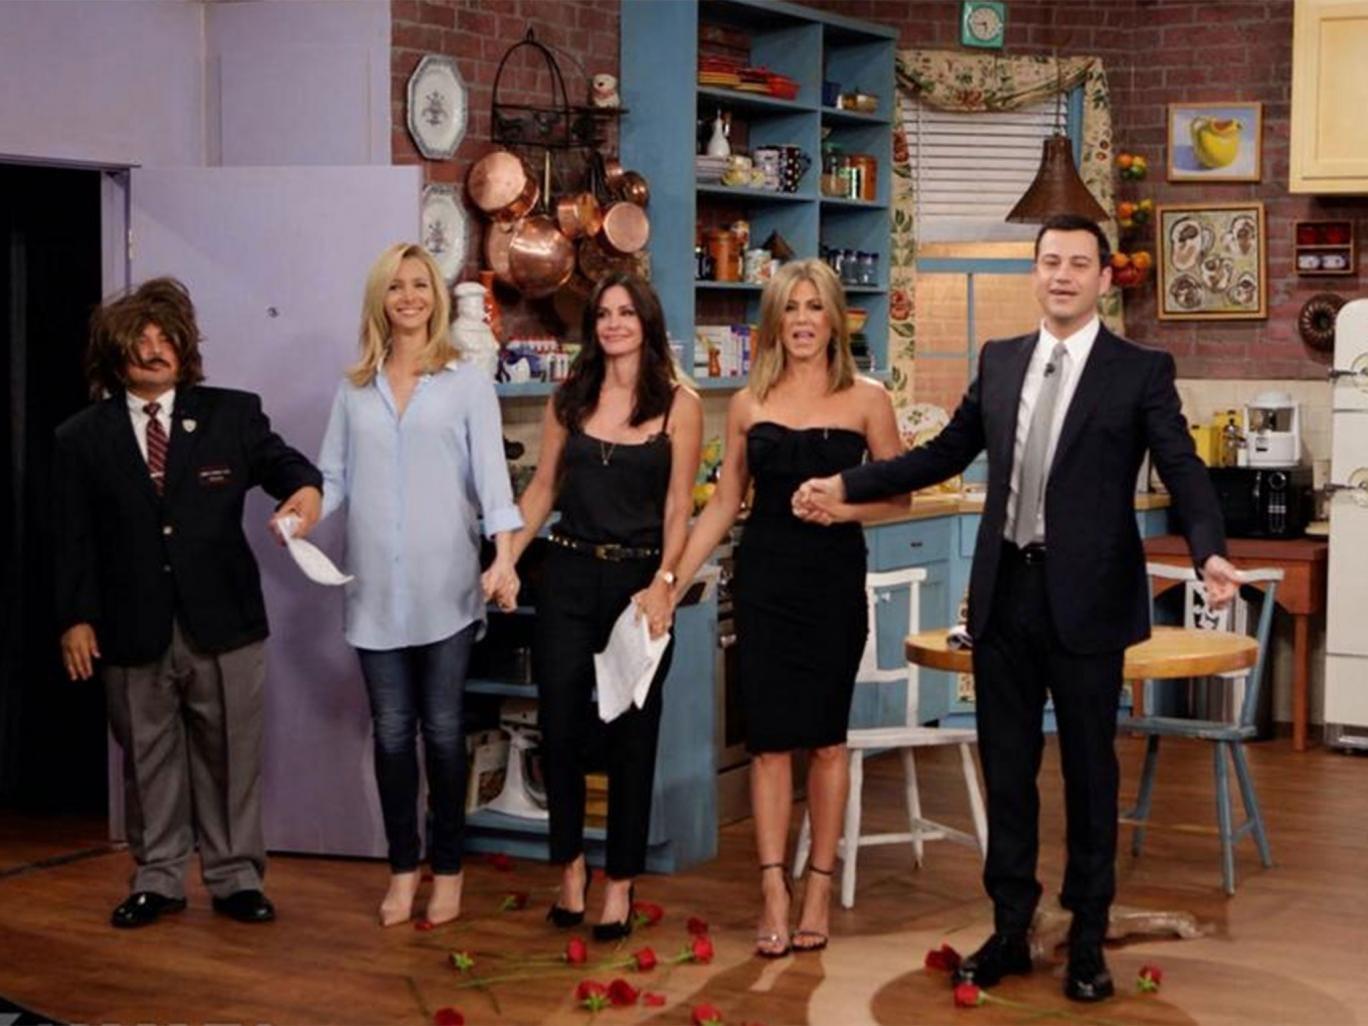 Lisa Kudrow, Courtney Cox and Jennifer Anniston reunite for a mini Friends sketch on Jimmy Kimmel Live